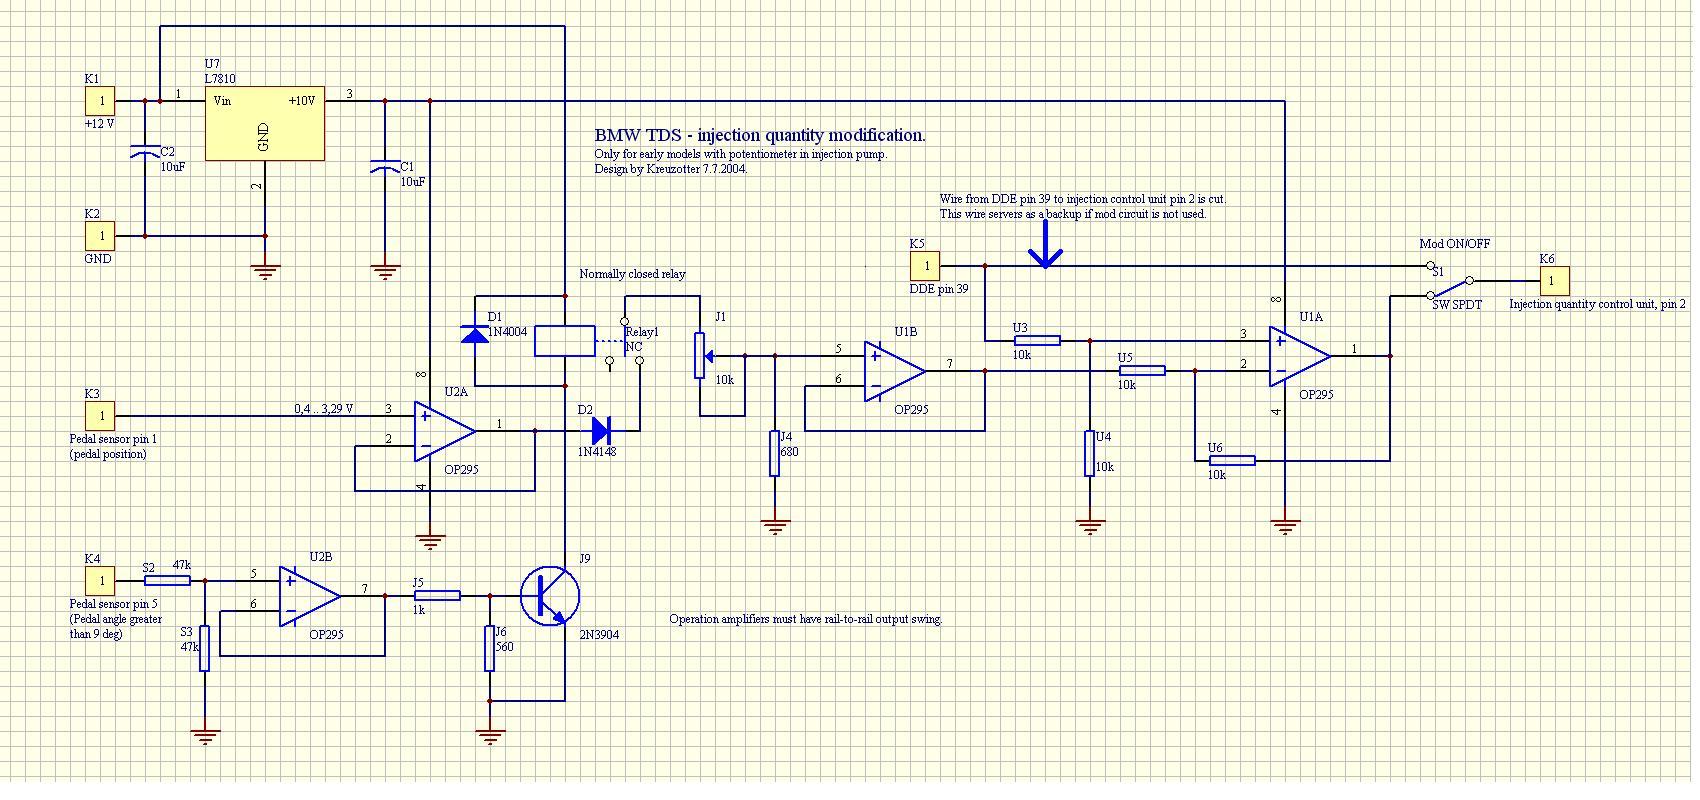 Bmw E39 525 Tds Wiring Diagram Wire Data Schema 5 Series Diagrams E36 E46 Air Intake E53 Rh Banyan Palace Com 2015 2010